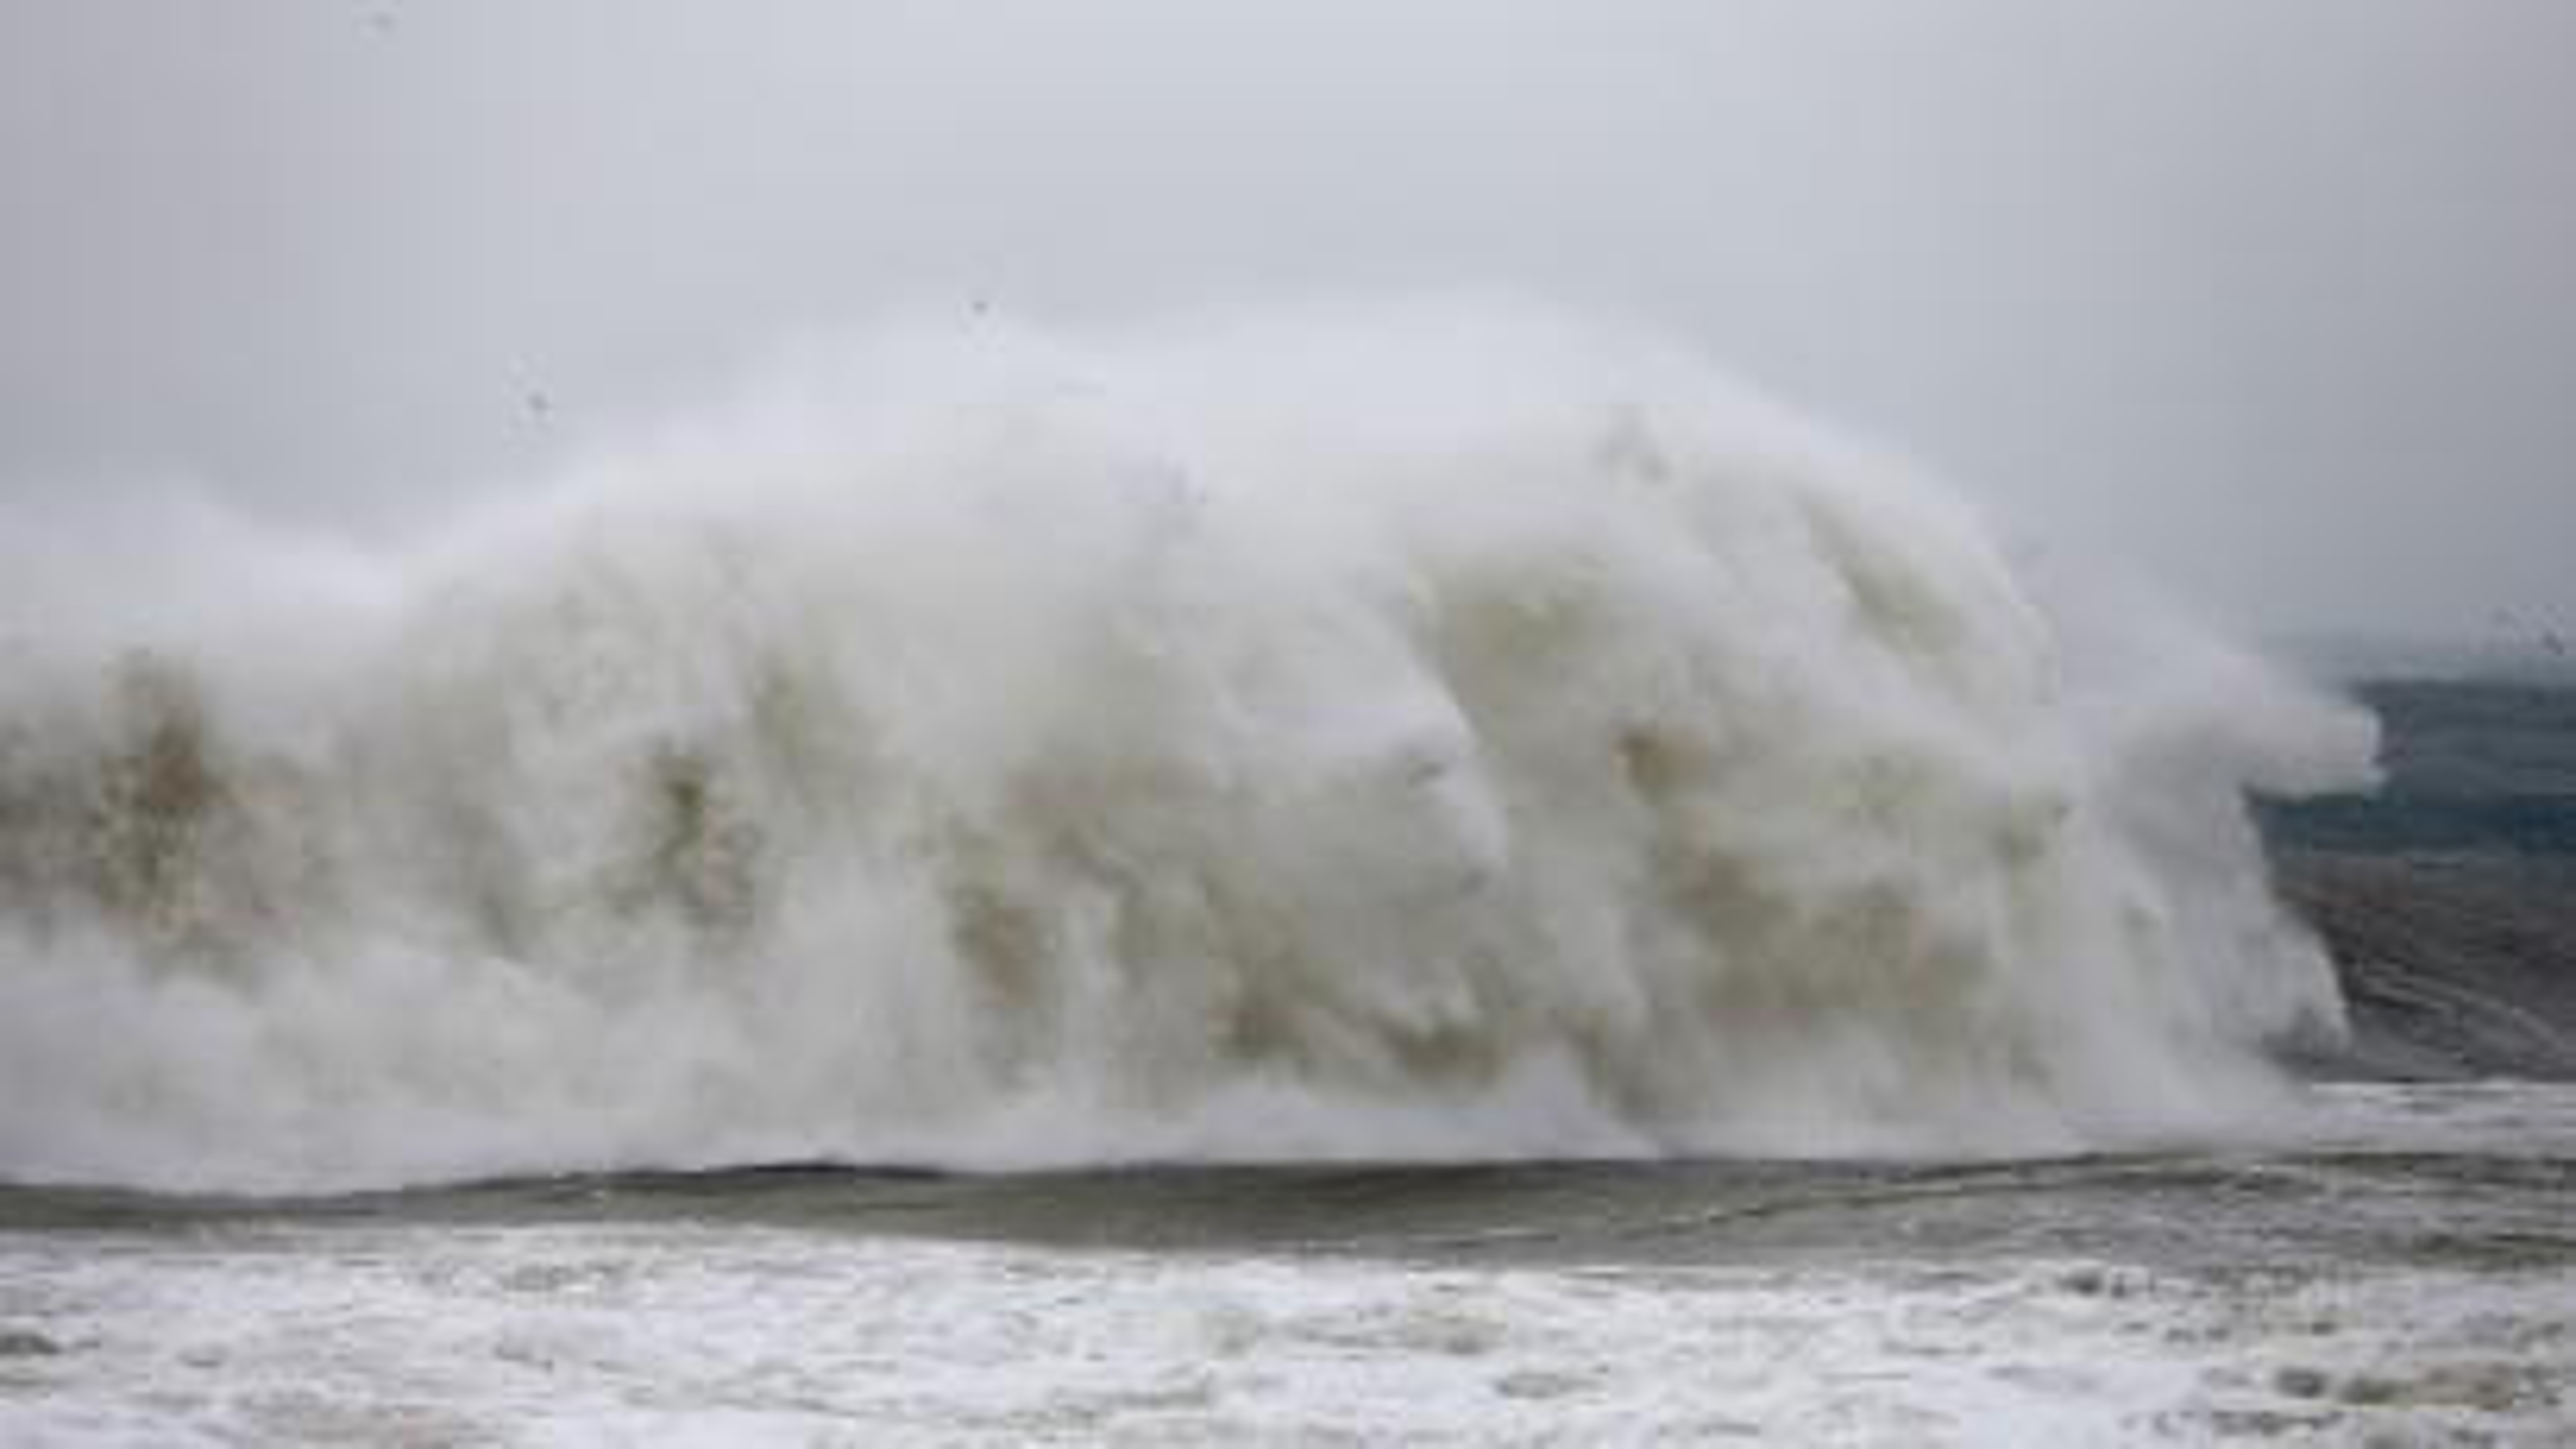 A big wave breaking on a shoreline